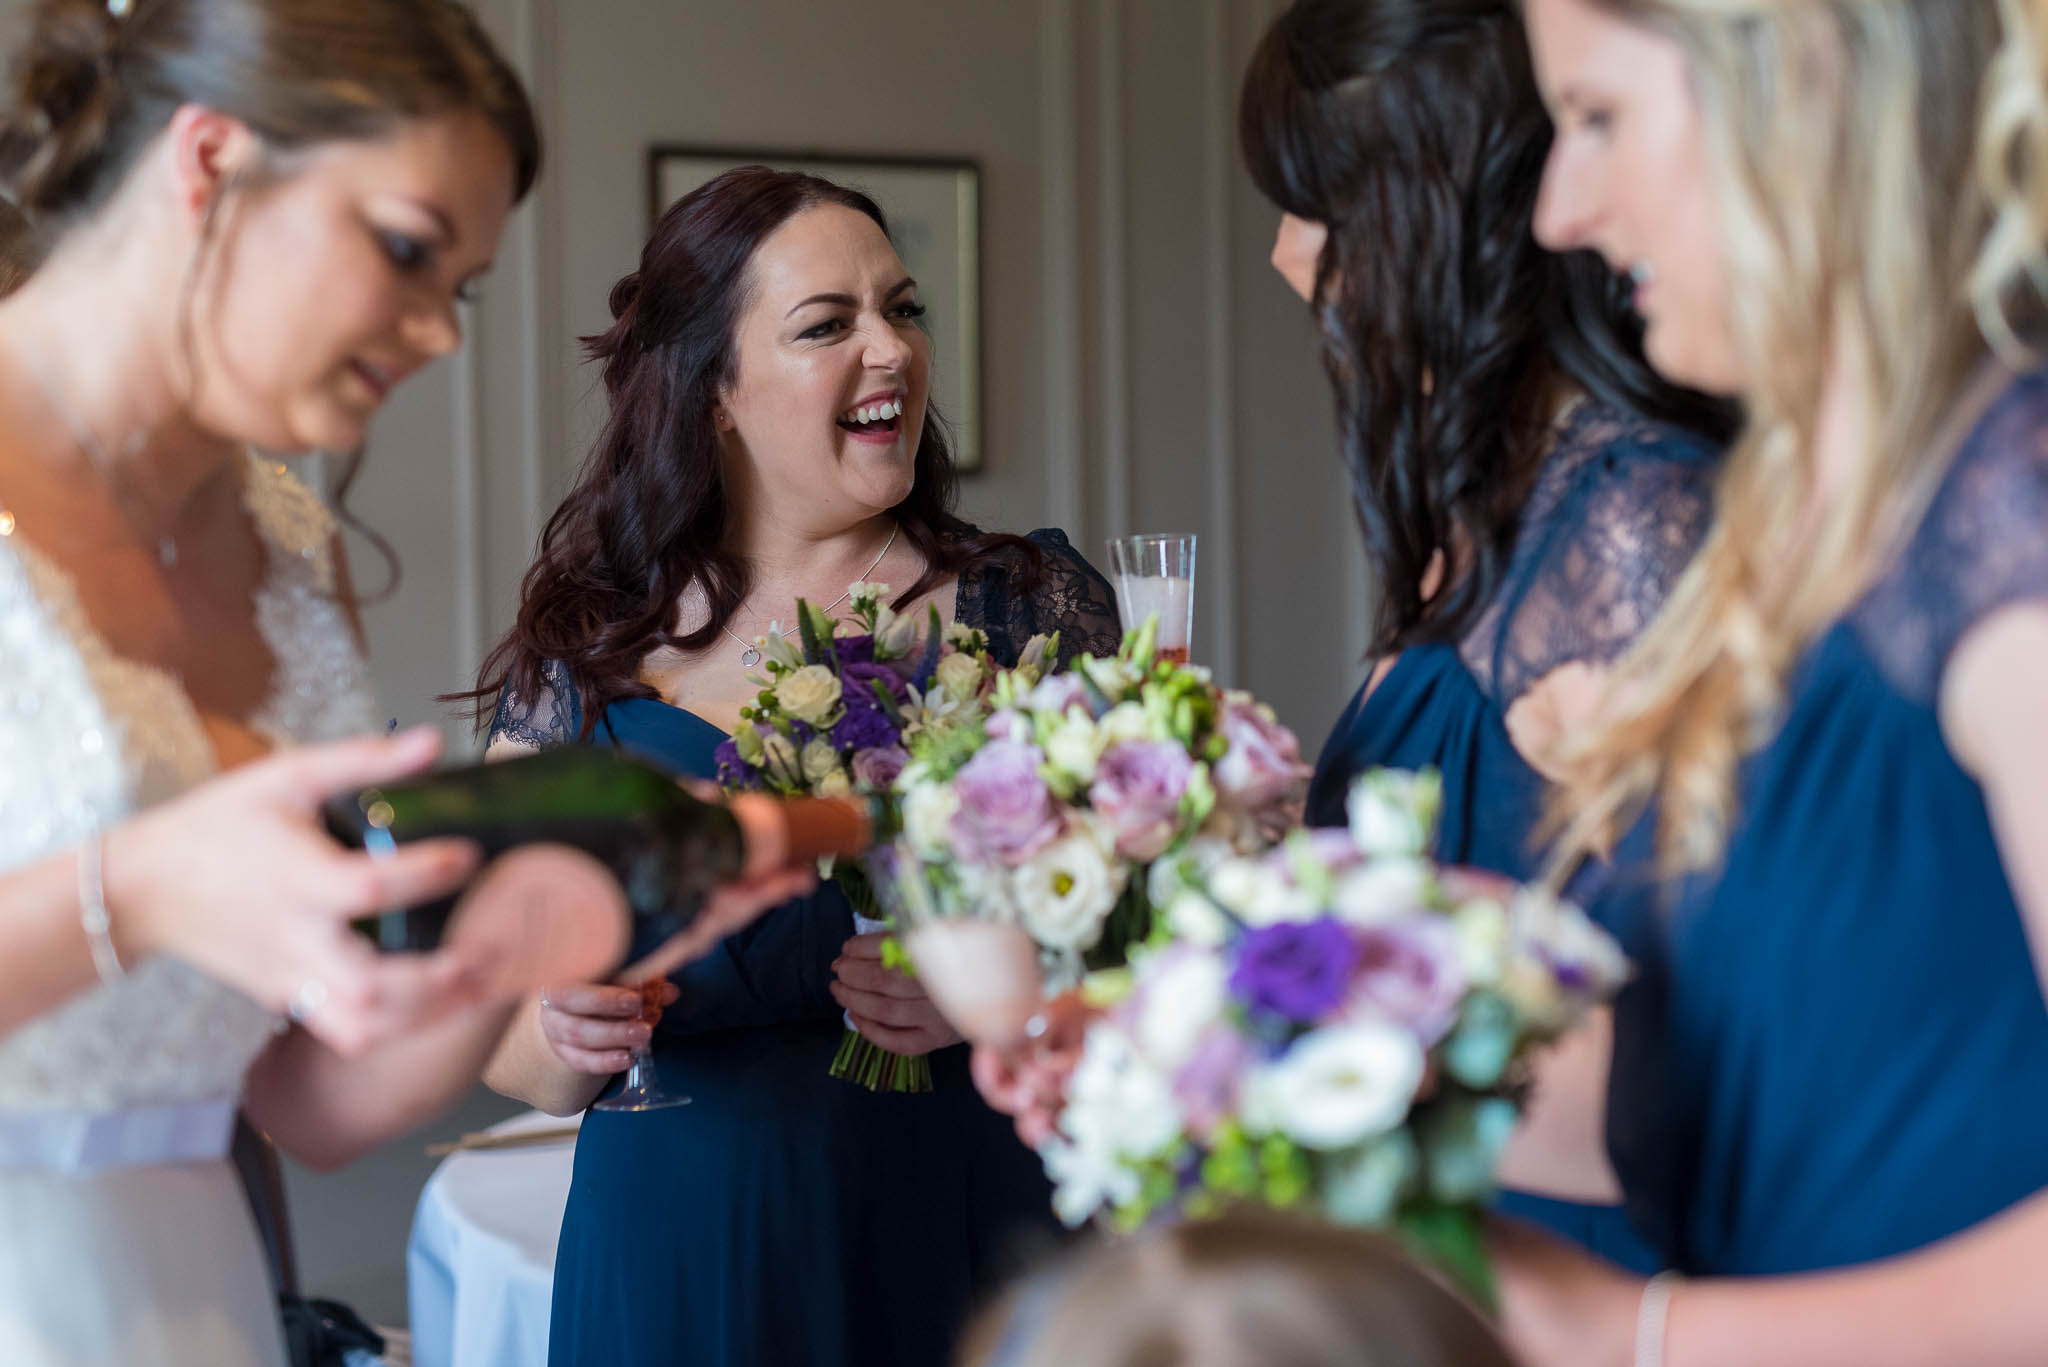 Crathorne Hall Hotel Wedding Photographer44.jpg